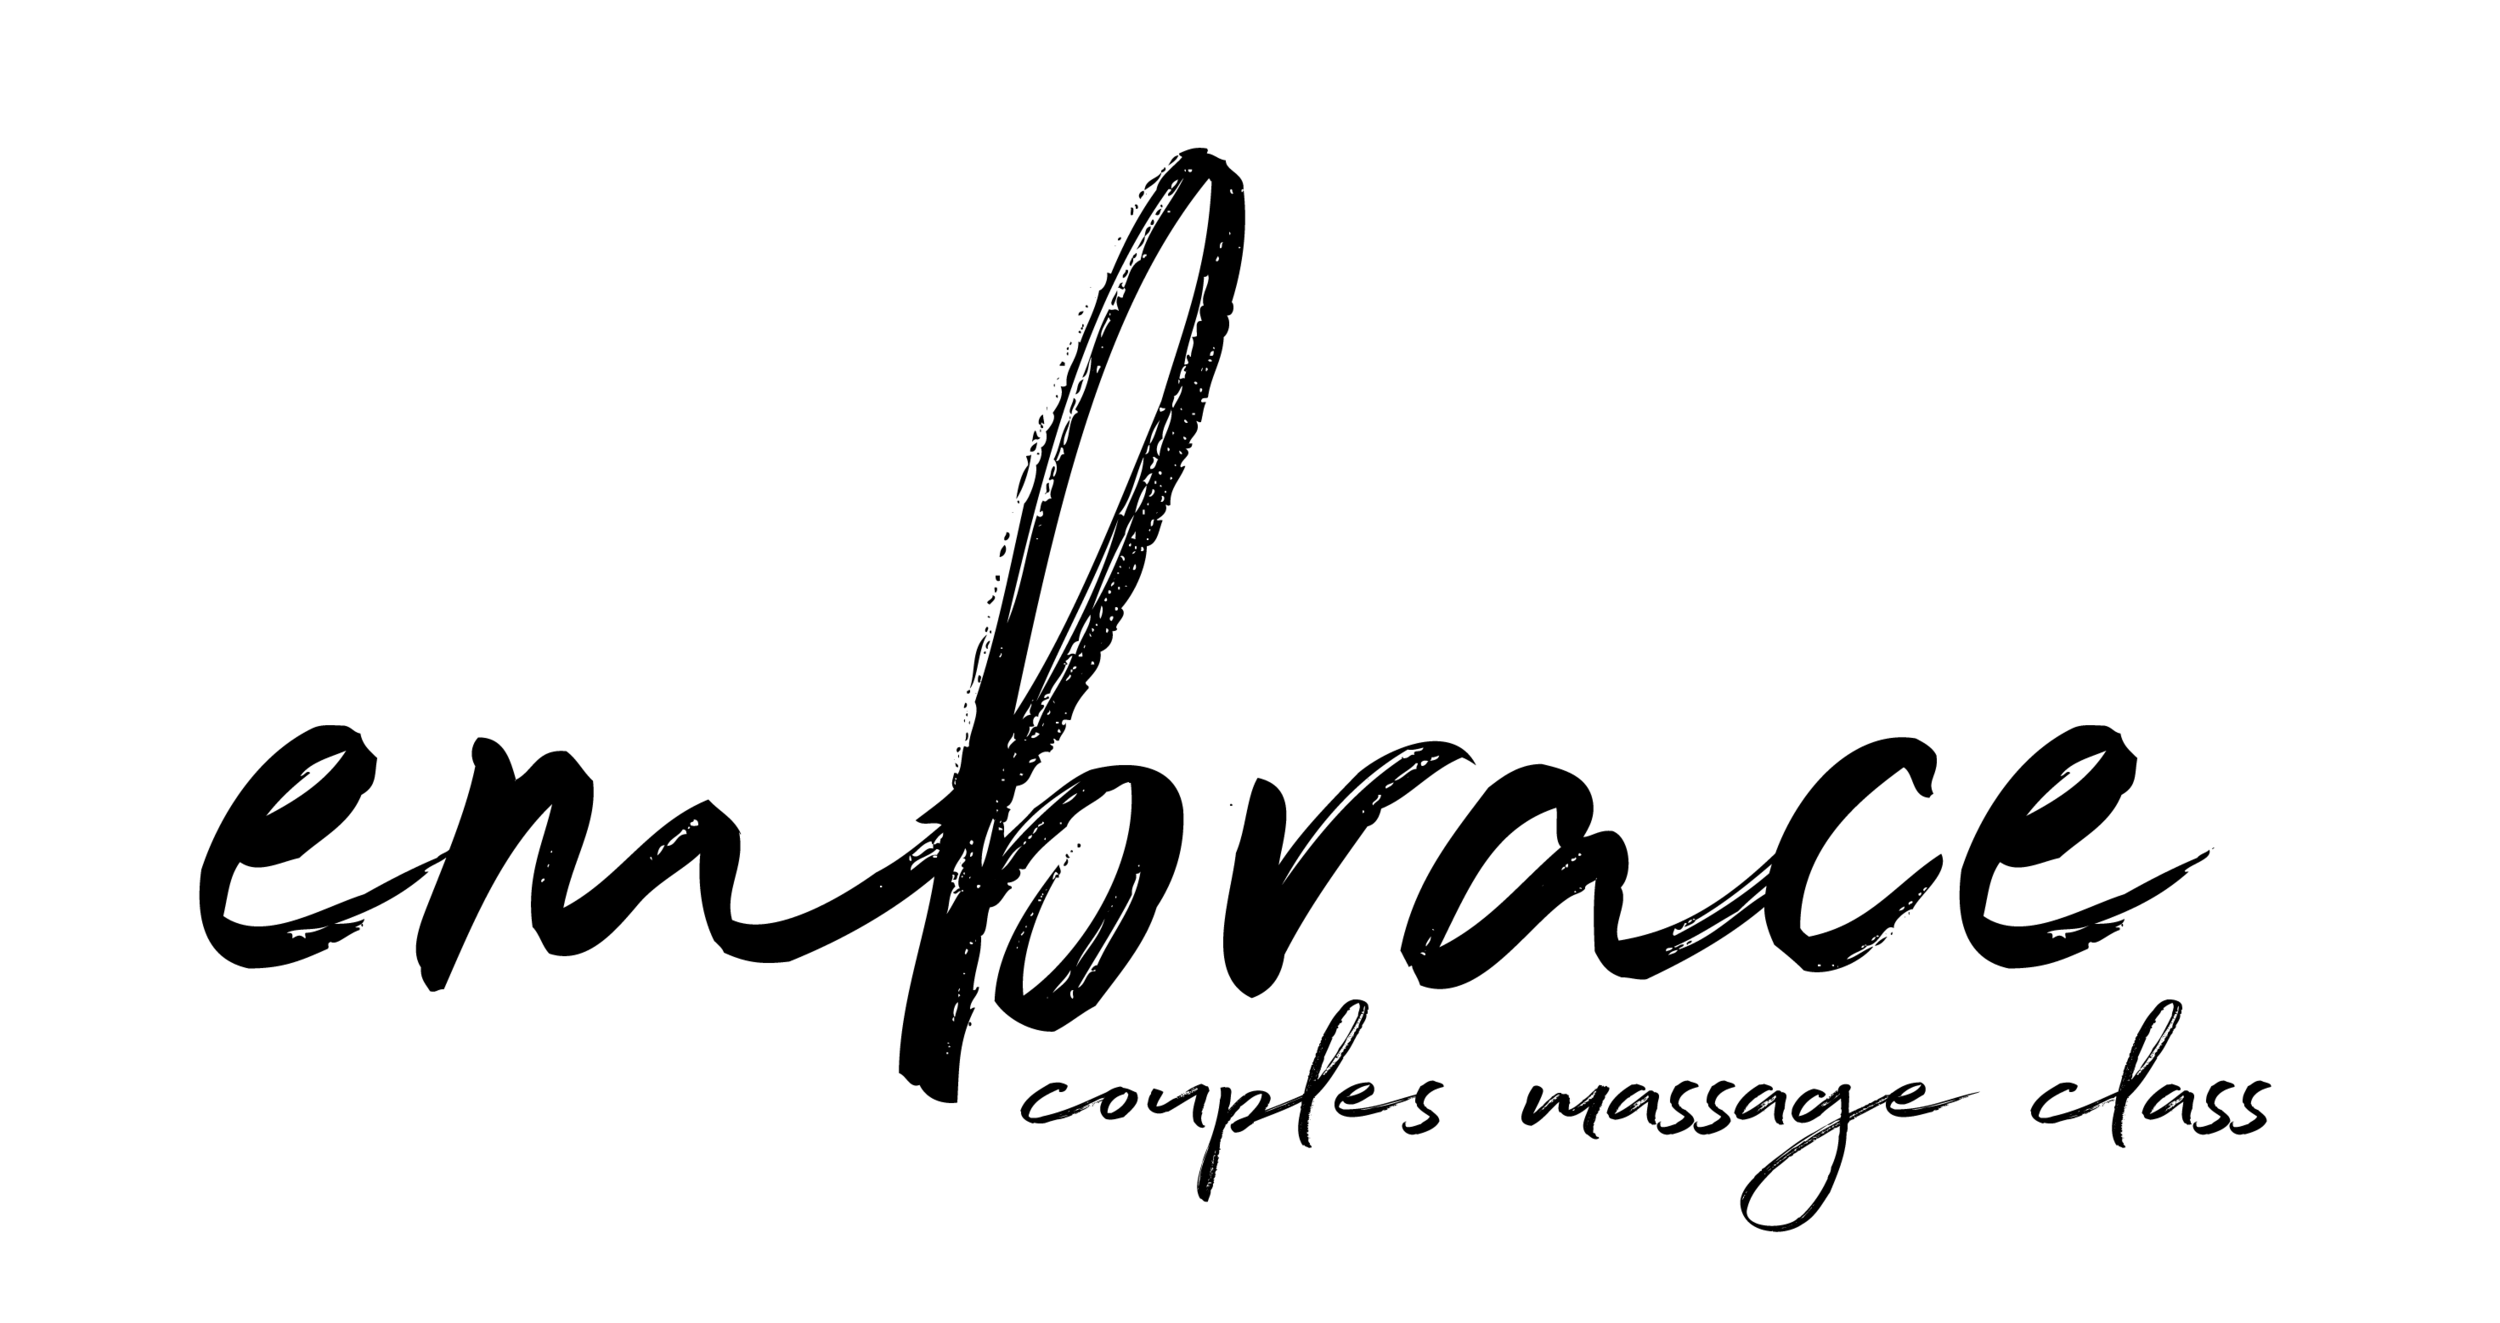 embrace black logo.png